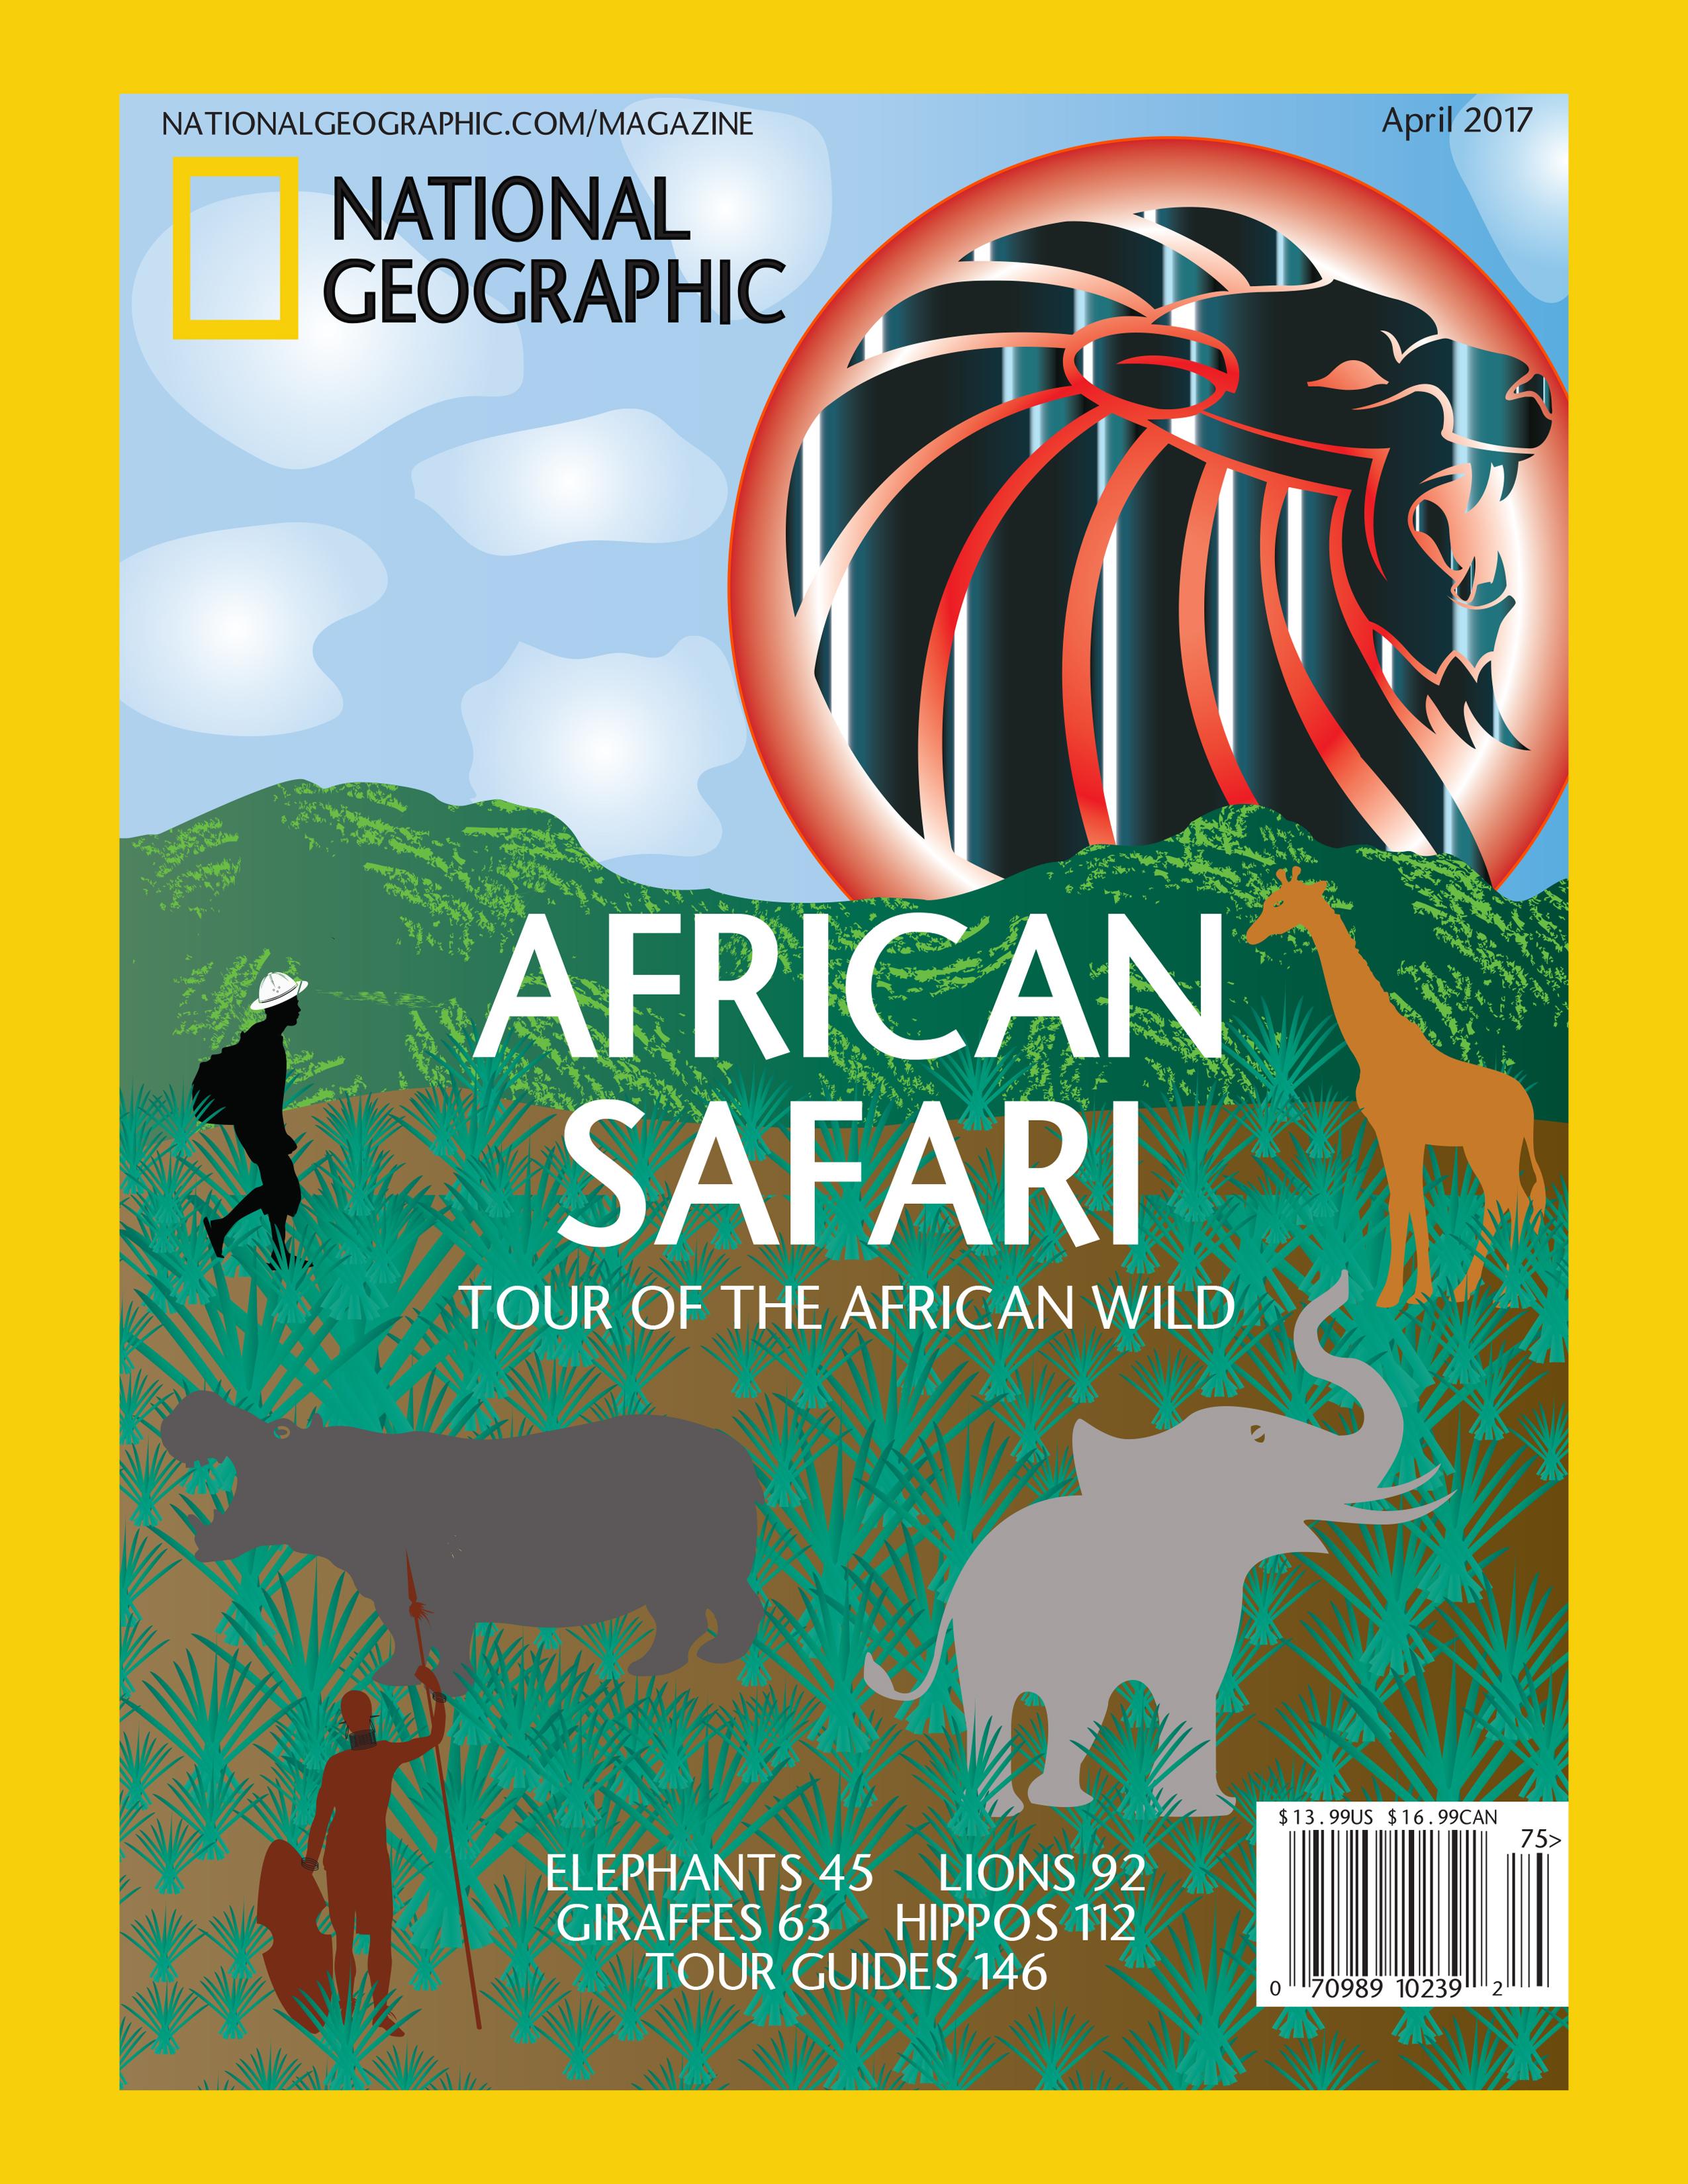 African Safari Magazine Cover